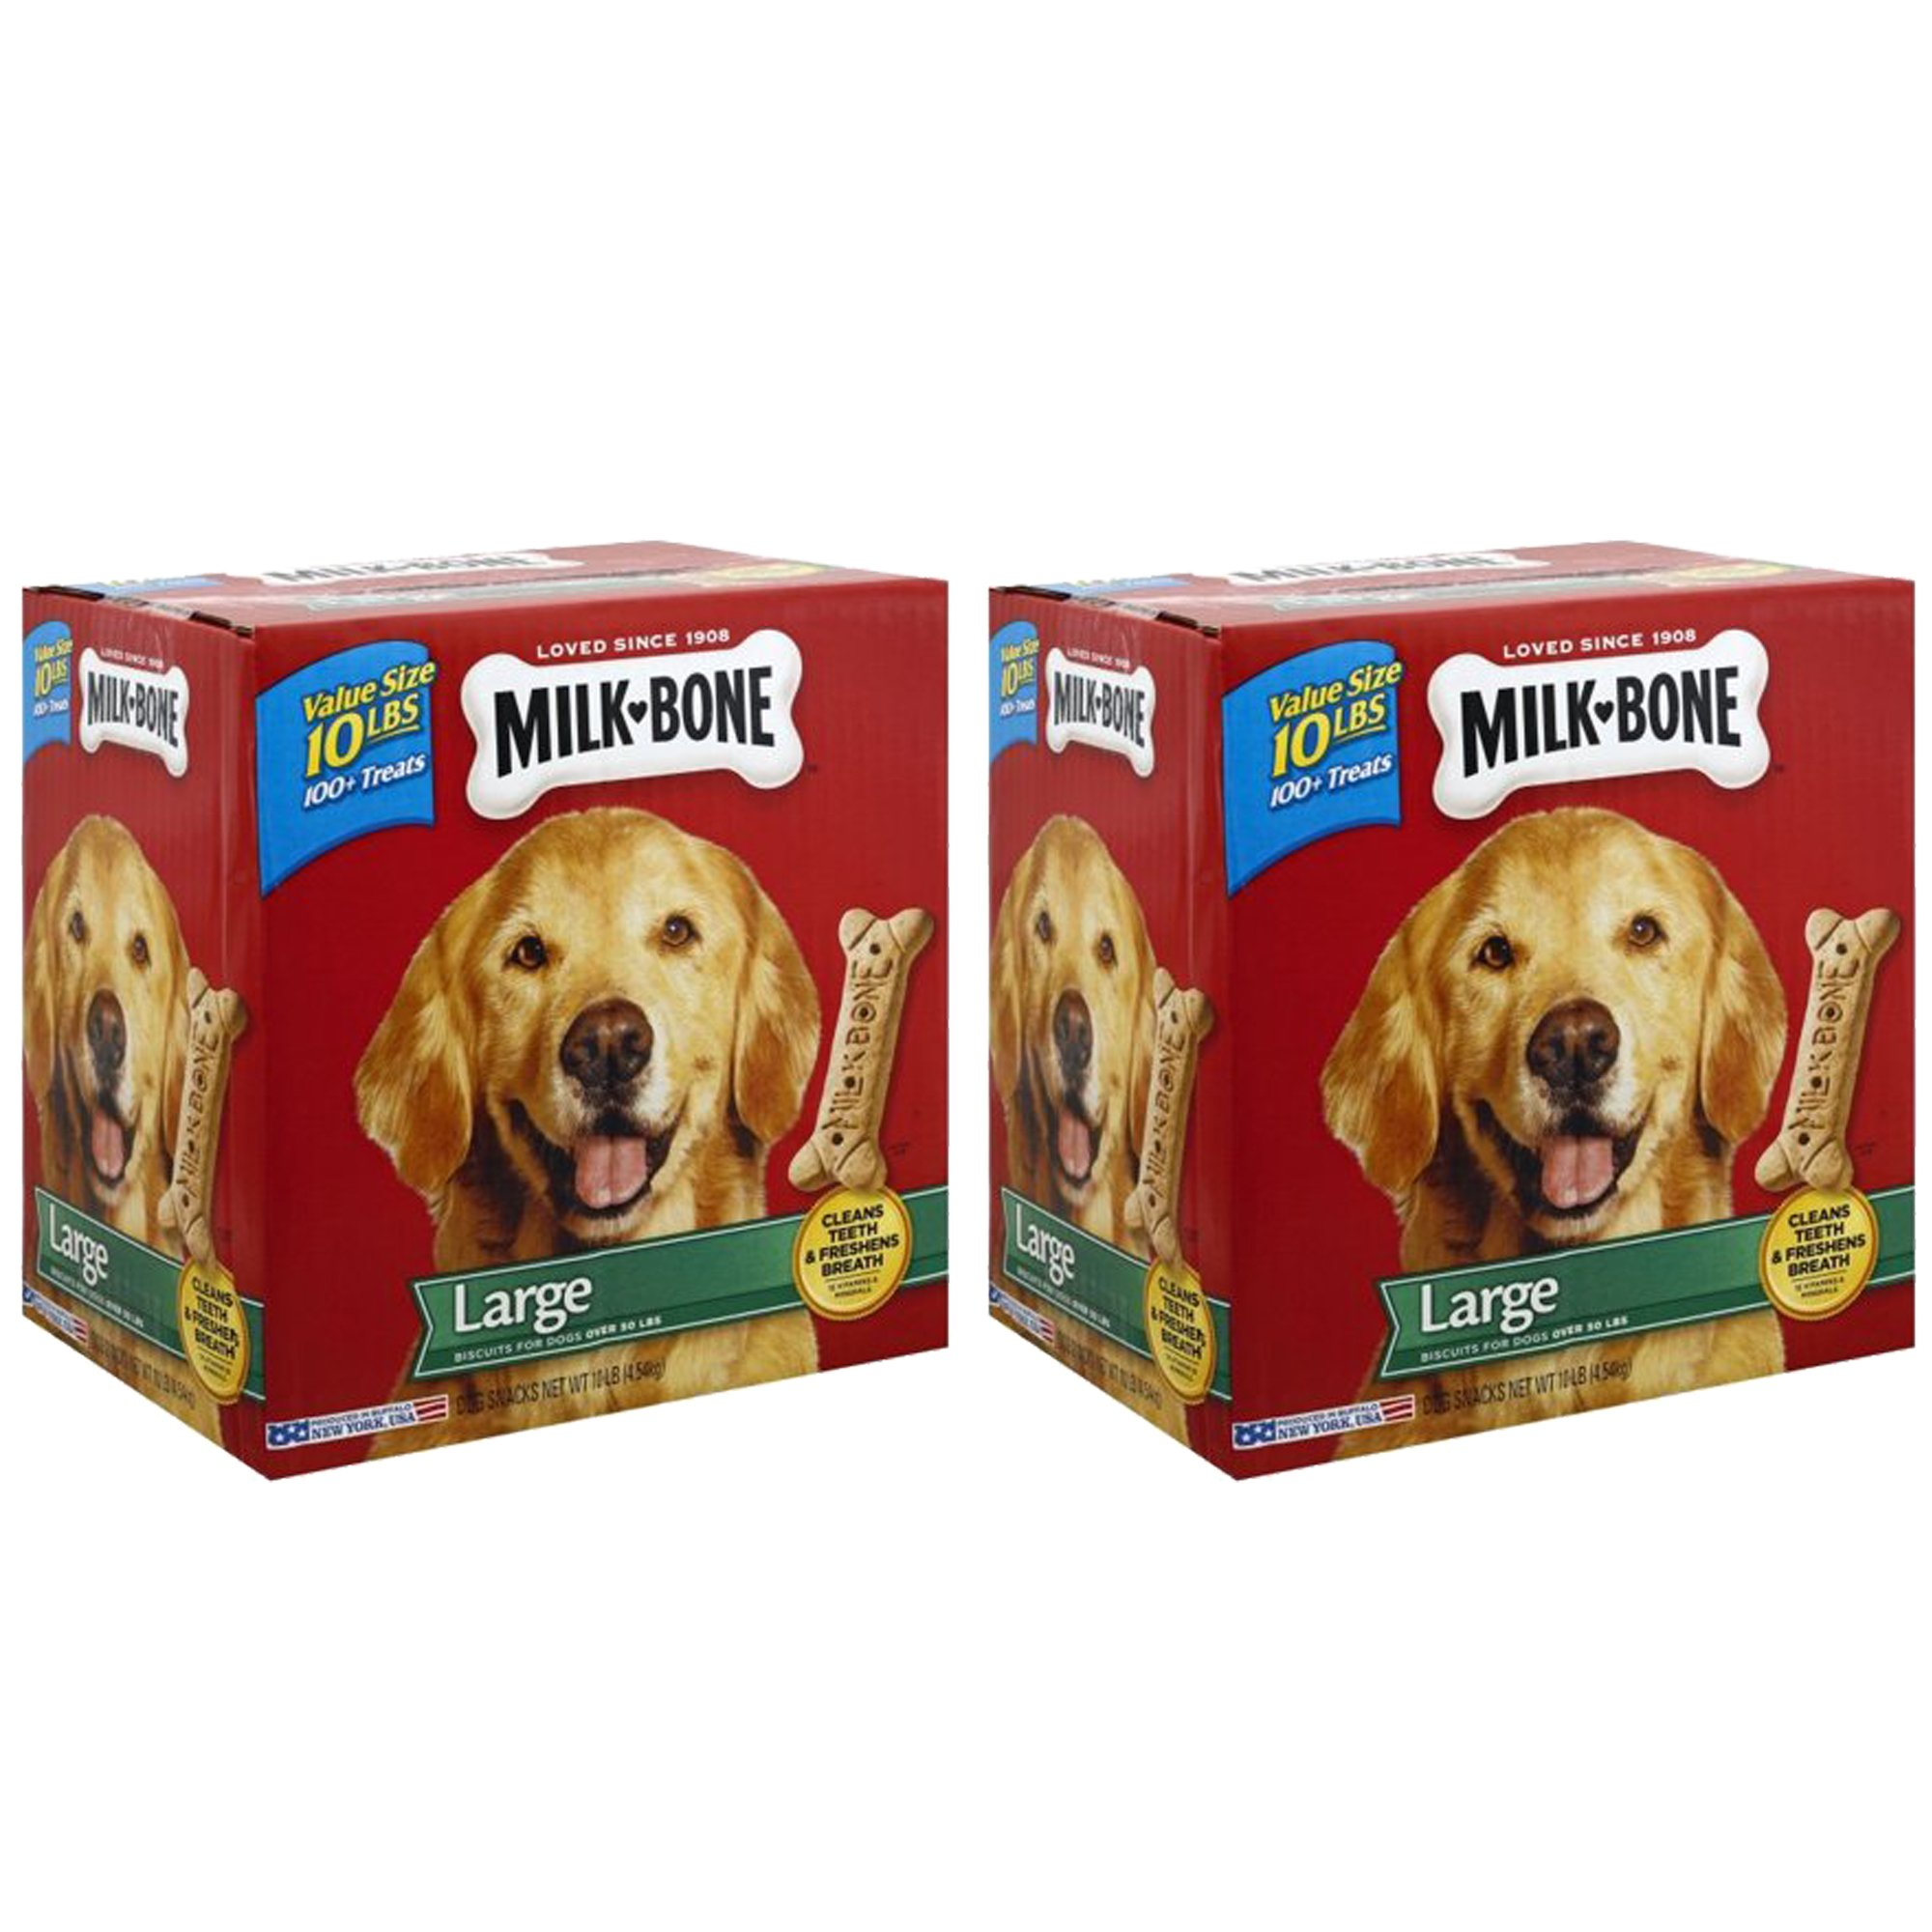 Milk-Bone Large Dog Biscuits, 10-Pound, 2-Pack